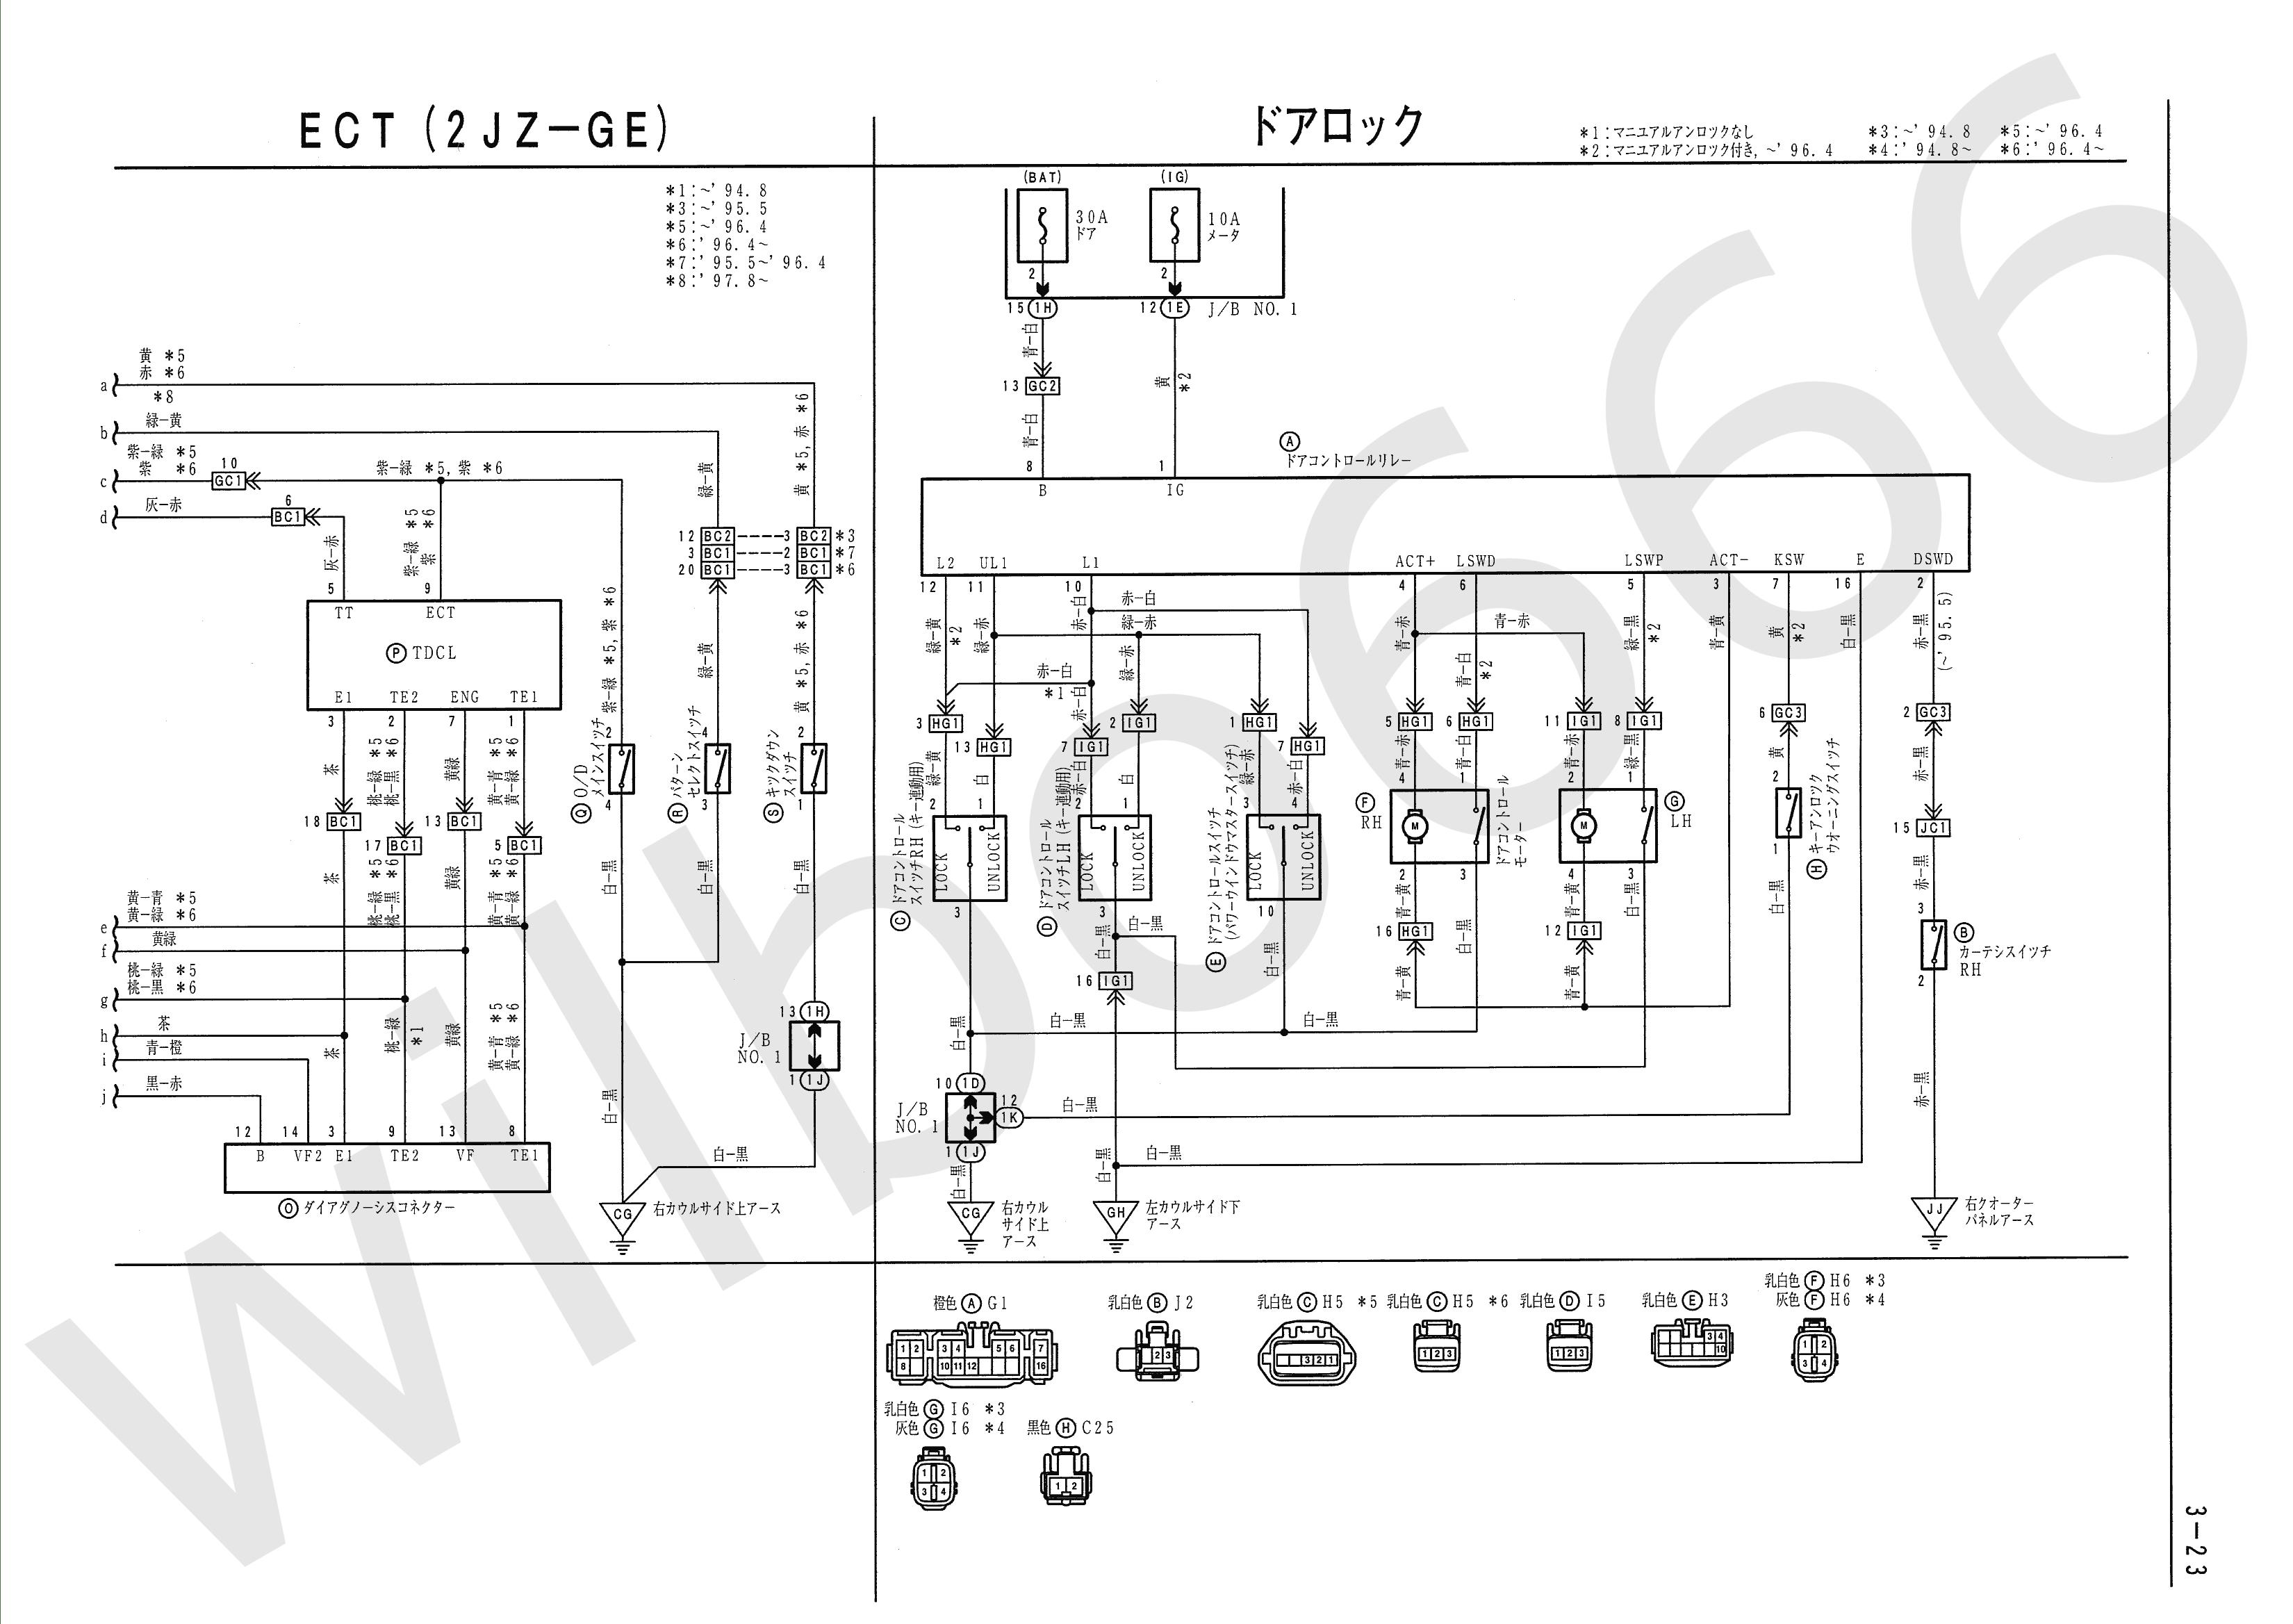 08 mack gu700 turn signal wiring wiring diagram grote turn signal switch wiring diagram 48272 wiring diagram 7 wire turn signal diagram 08 mack gu700 turn signal wiring asfbconference2016 Choice Image